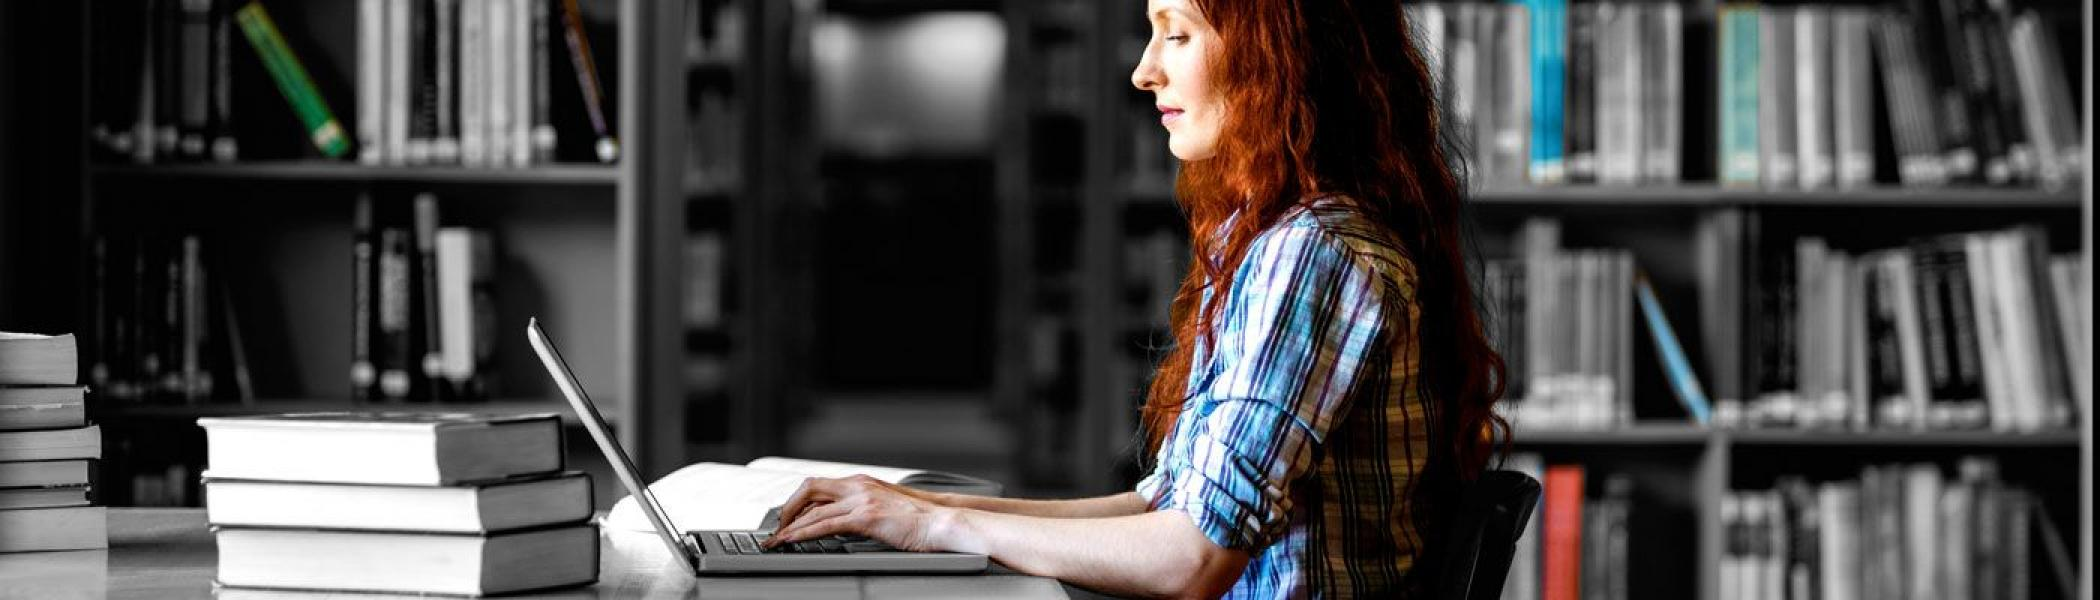 Student applying online to graduate studies at Trent University.